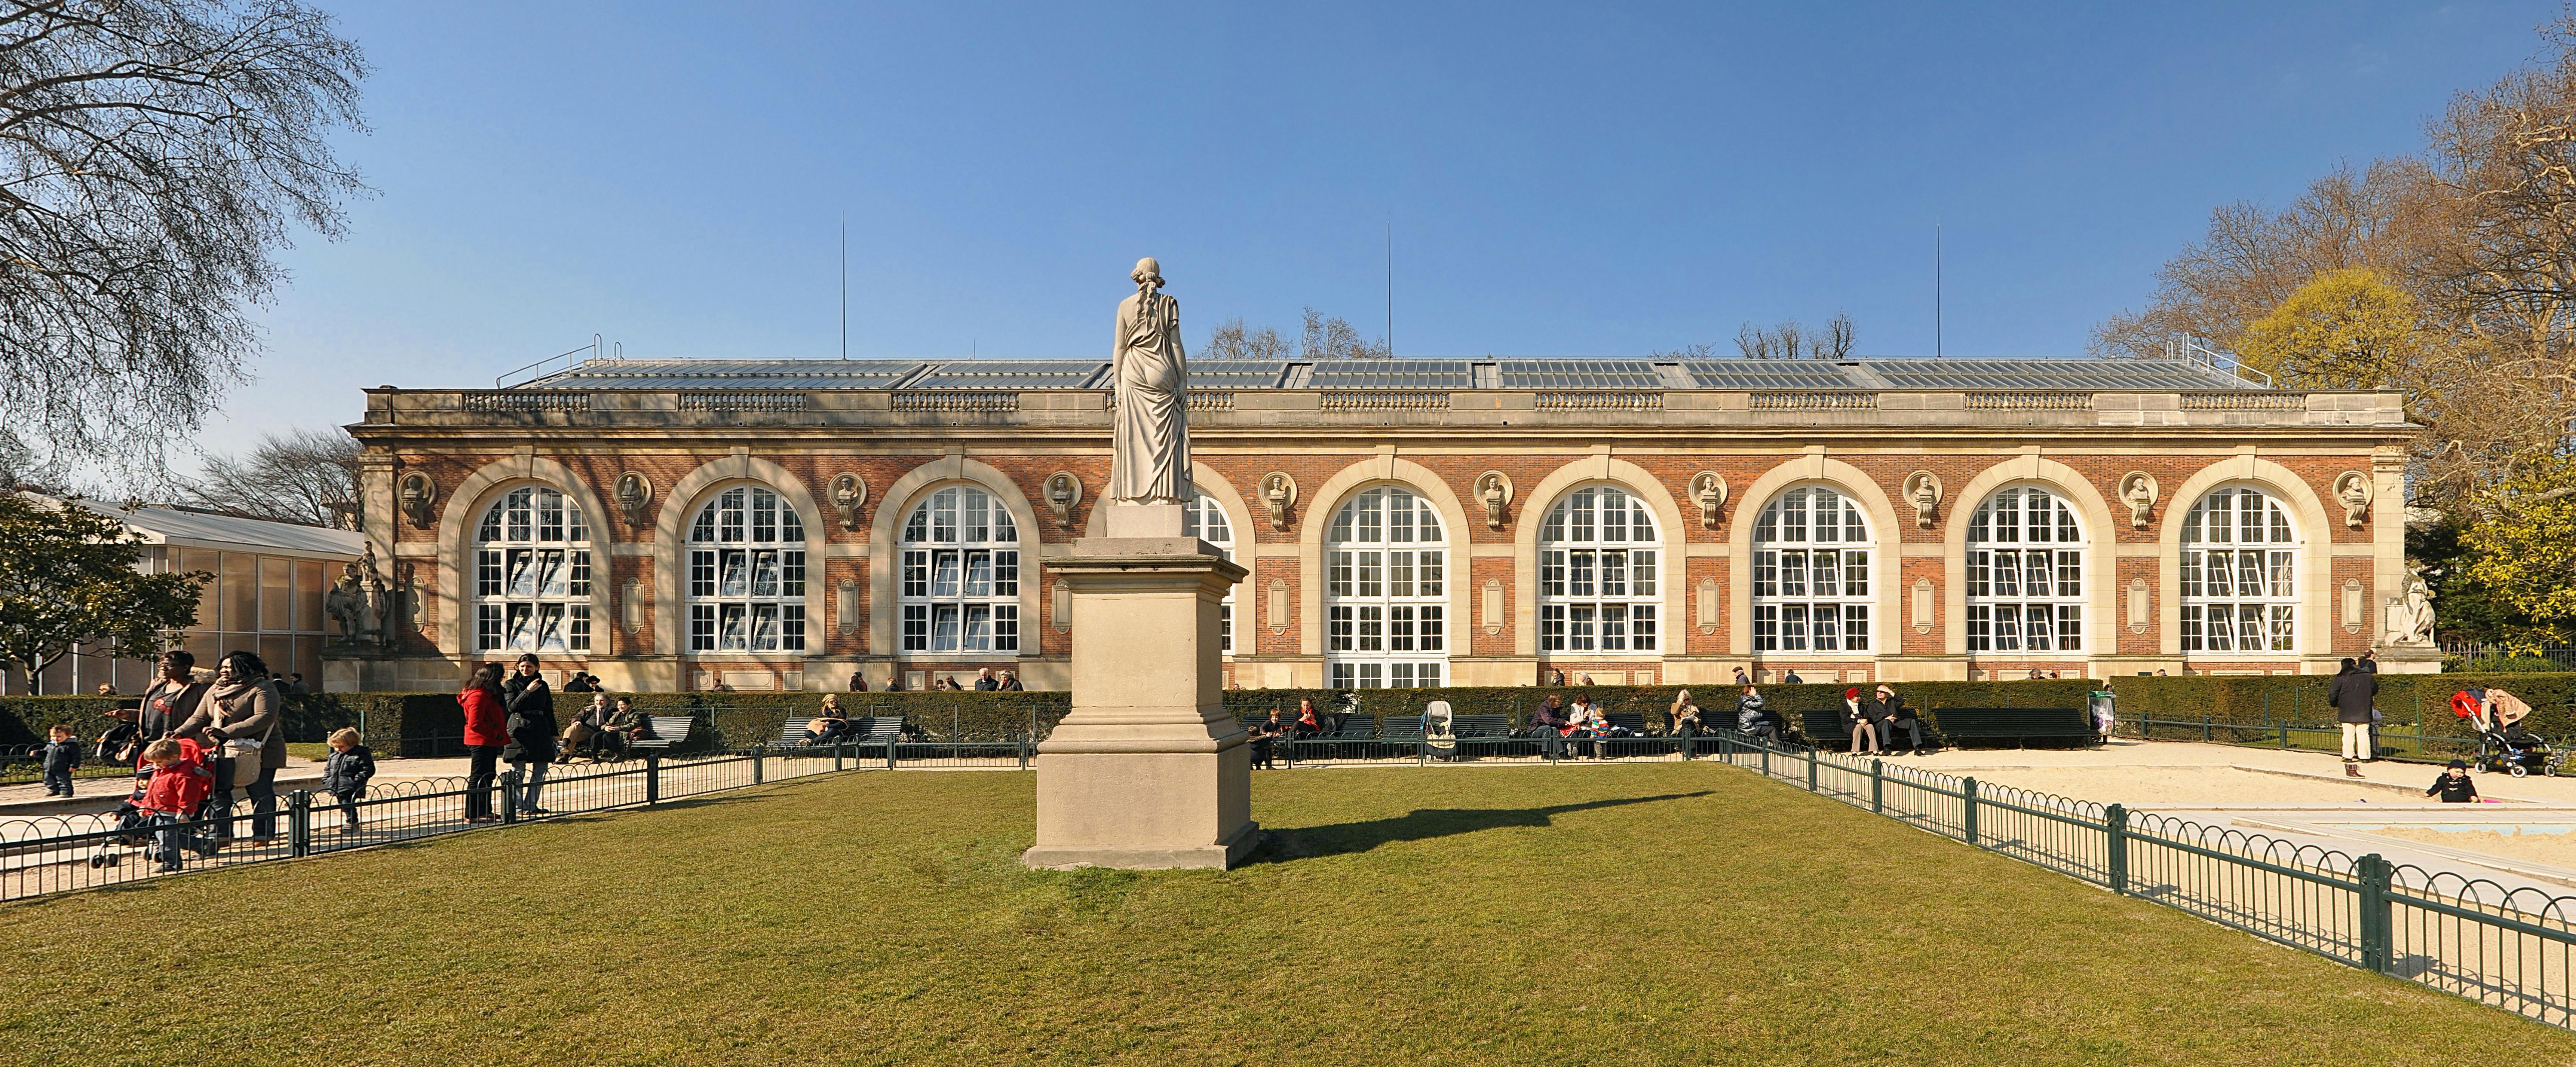 File orangerie du jardin du luxembourg paris for Le jardin luxembourg